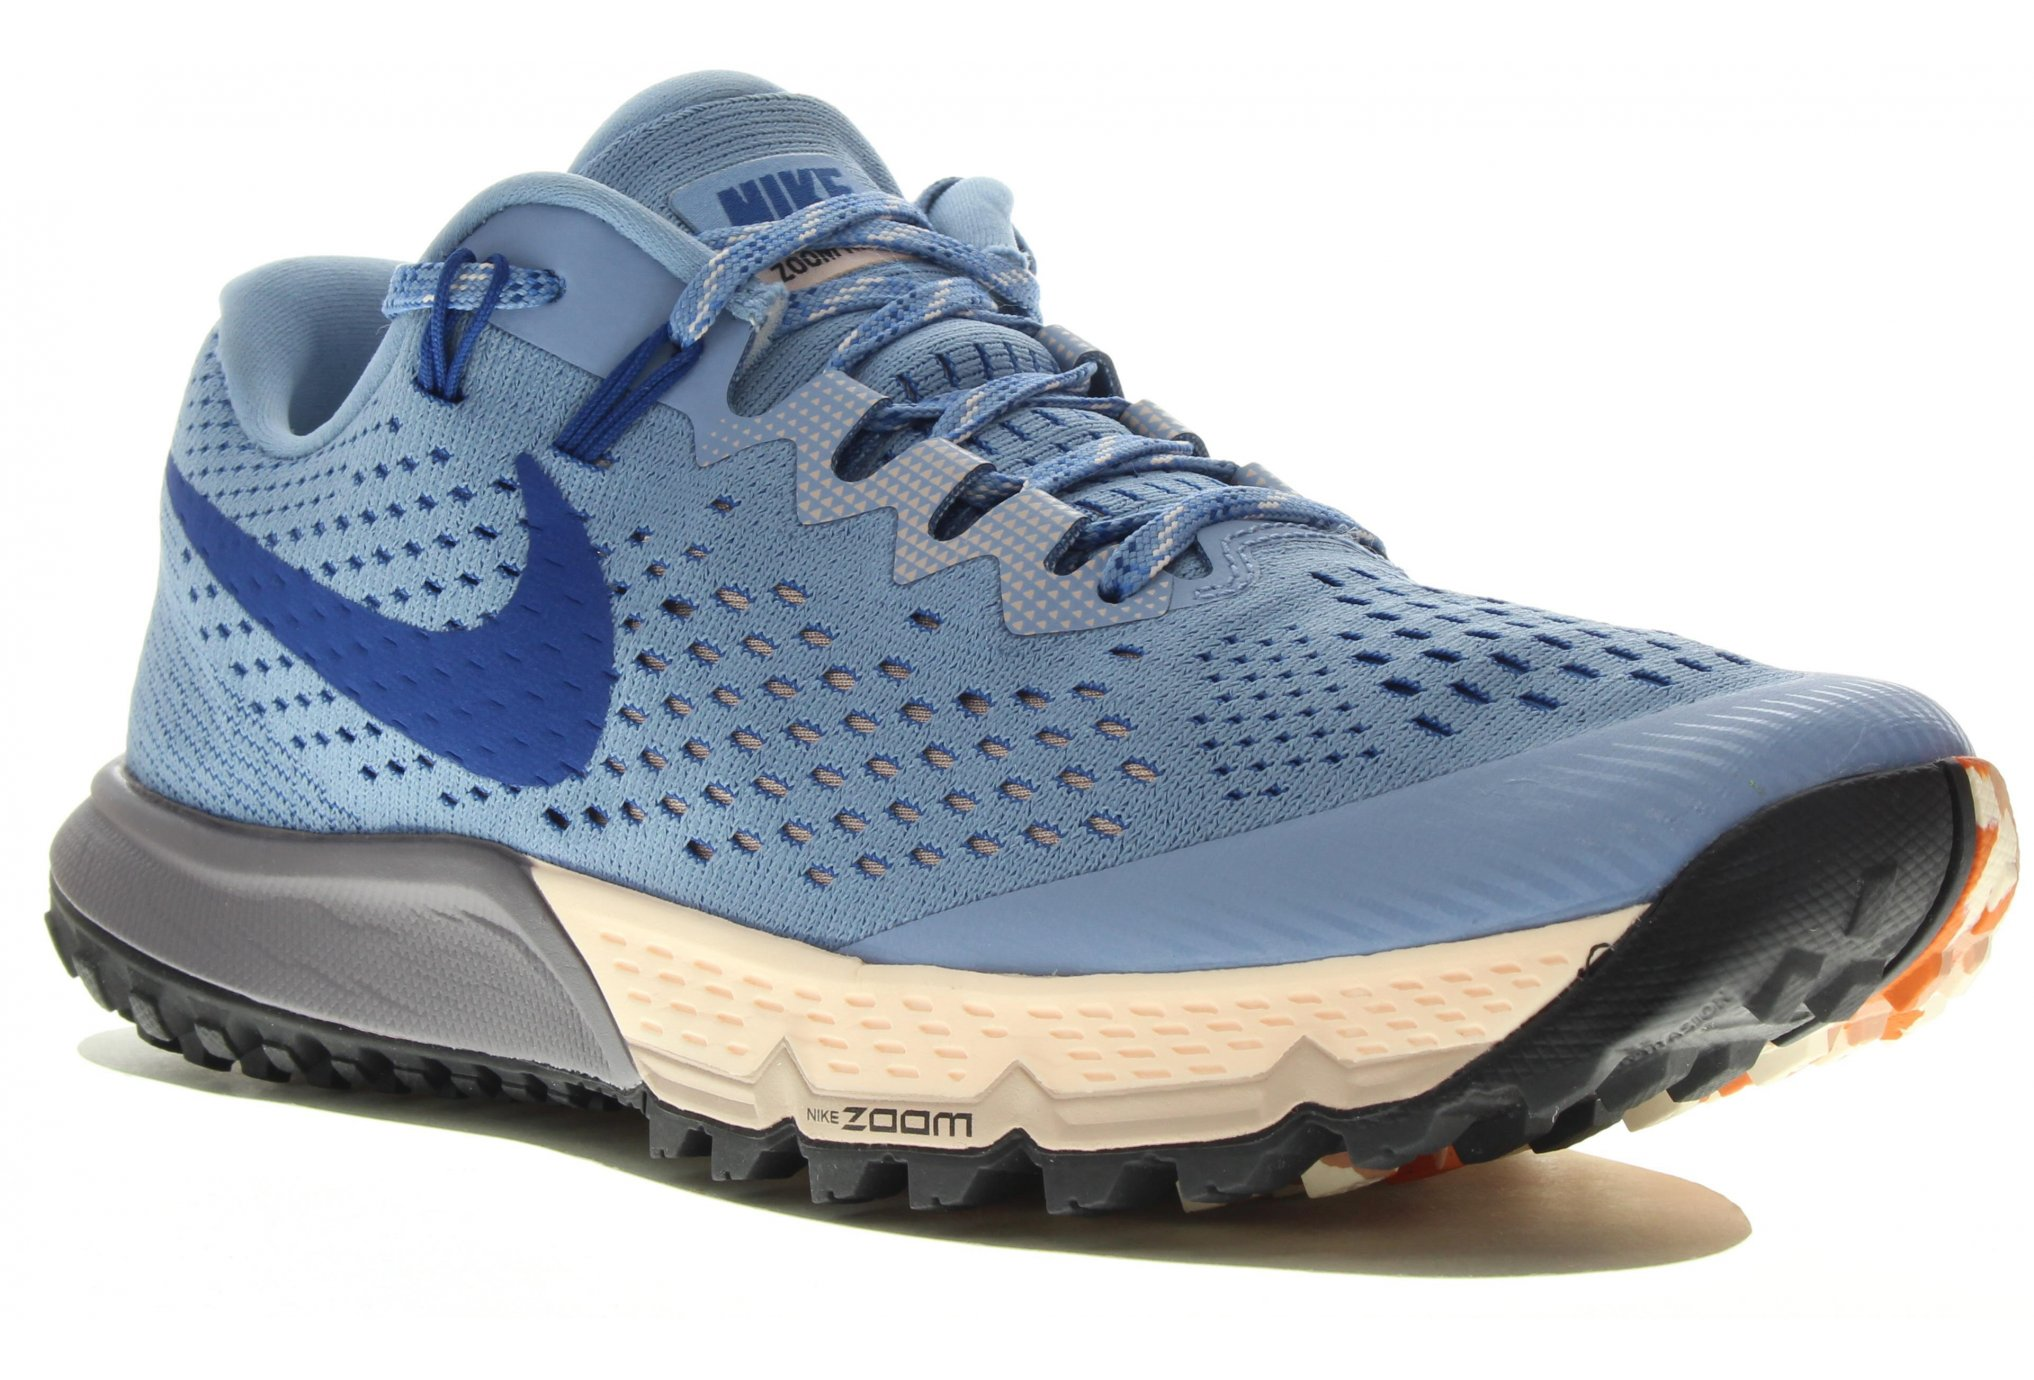 Nike Air Zoom Terra Kiger 4 W Chaussures running femme